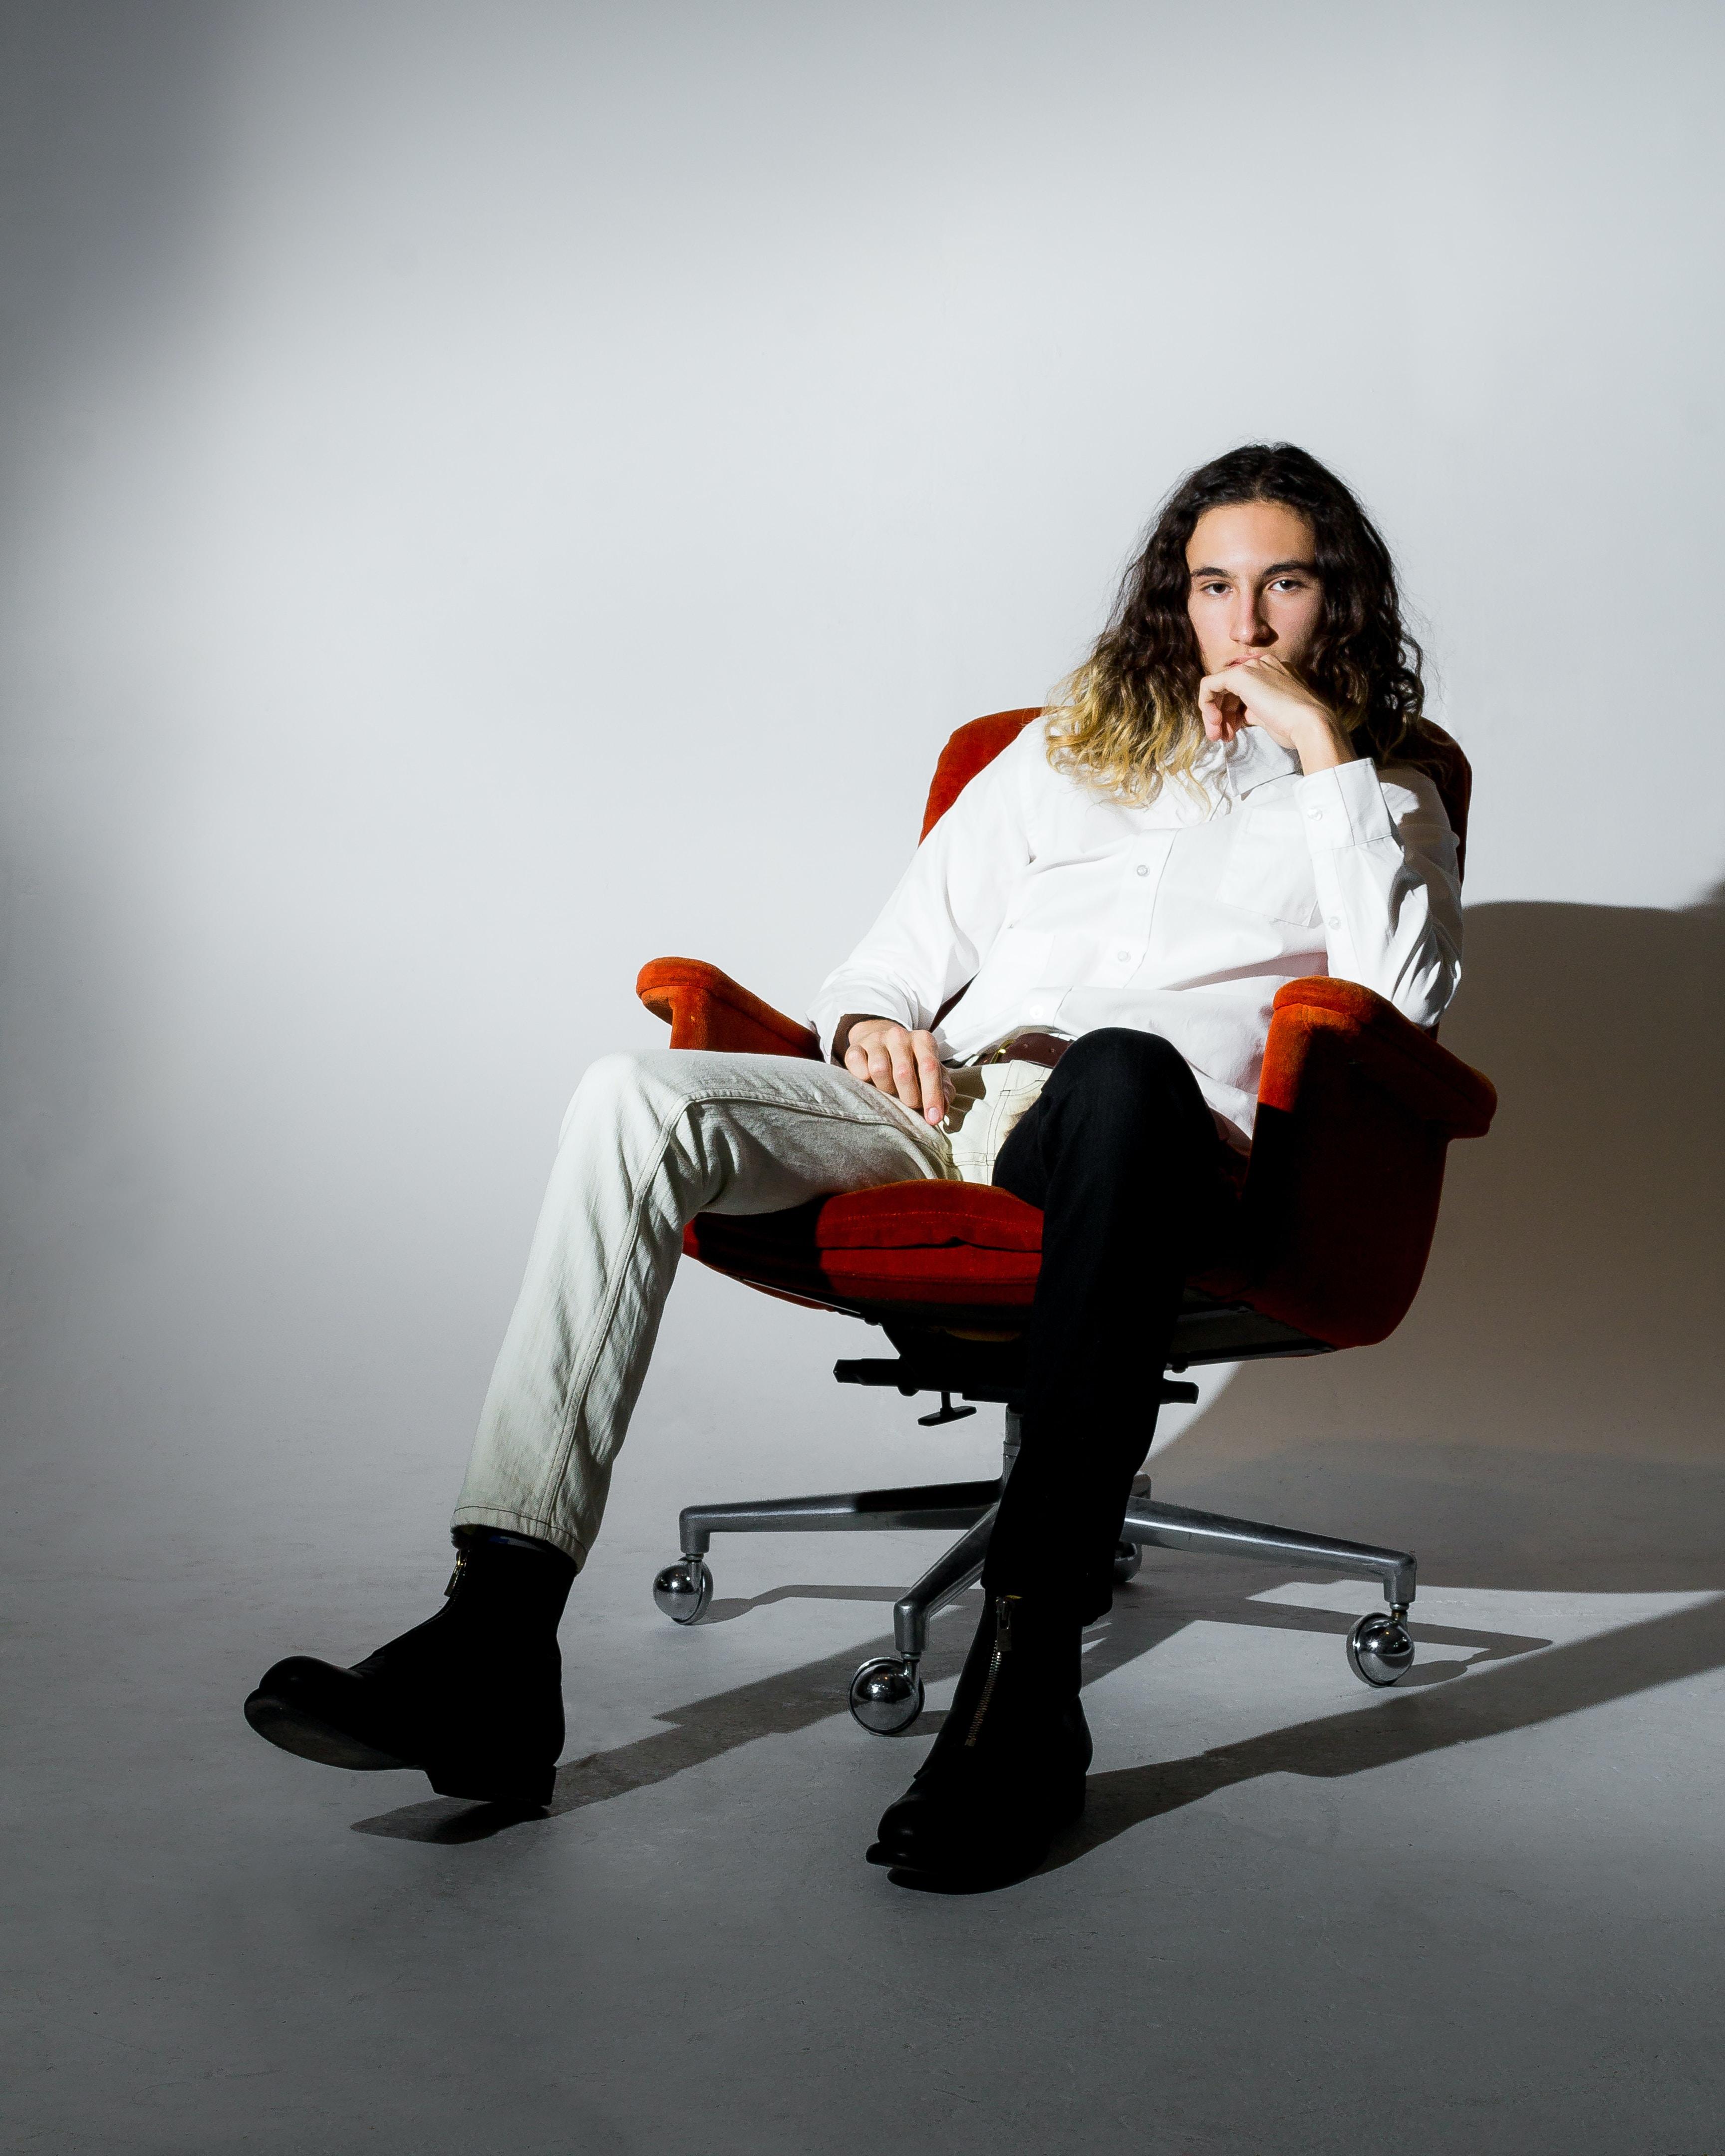 man sitting on rolling chair inside well-lit romo